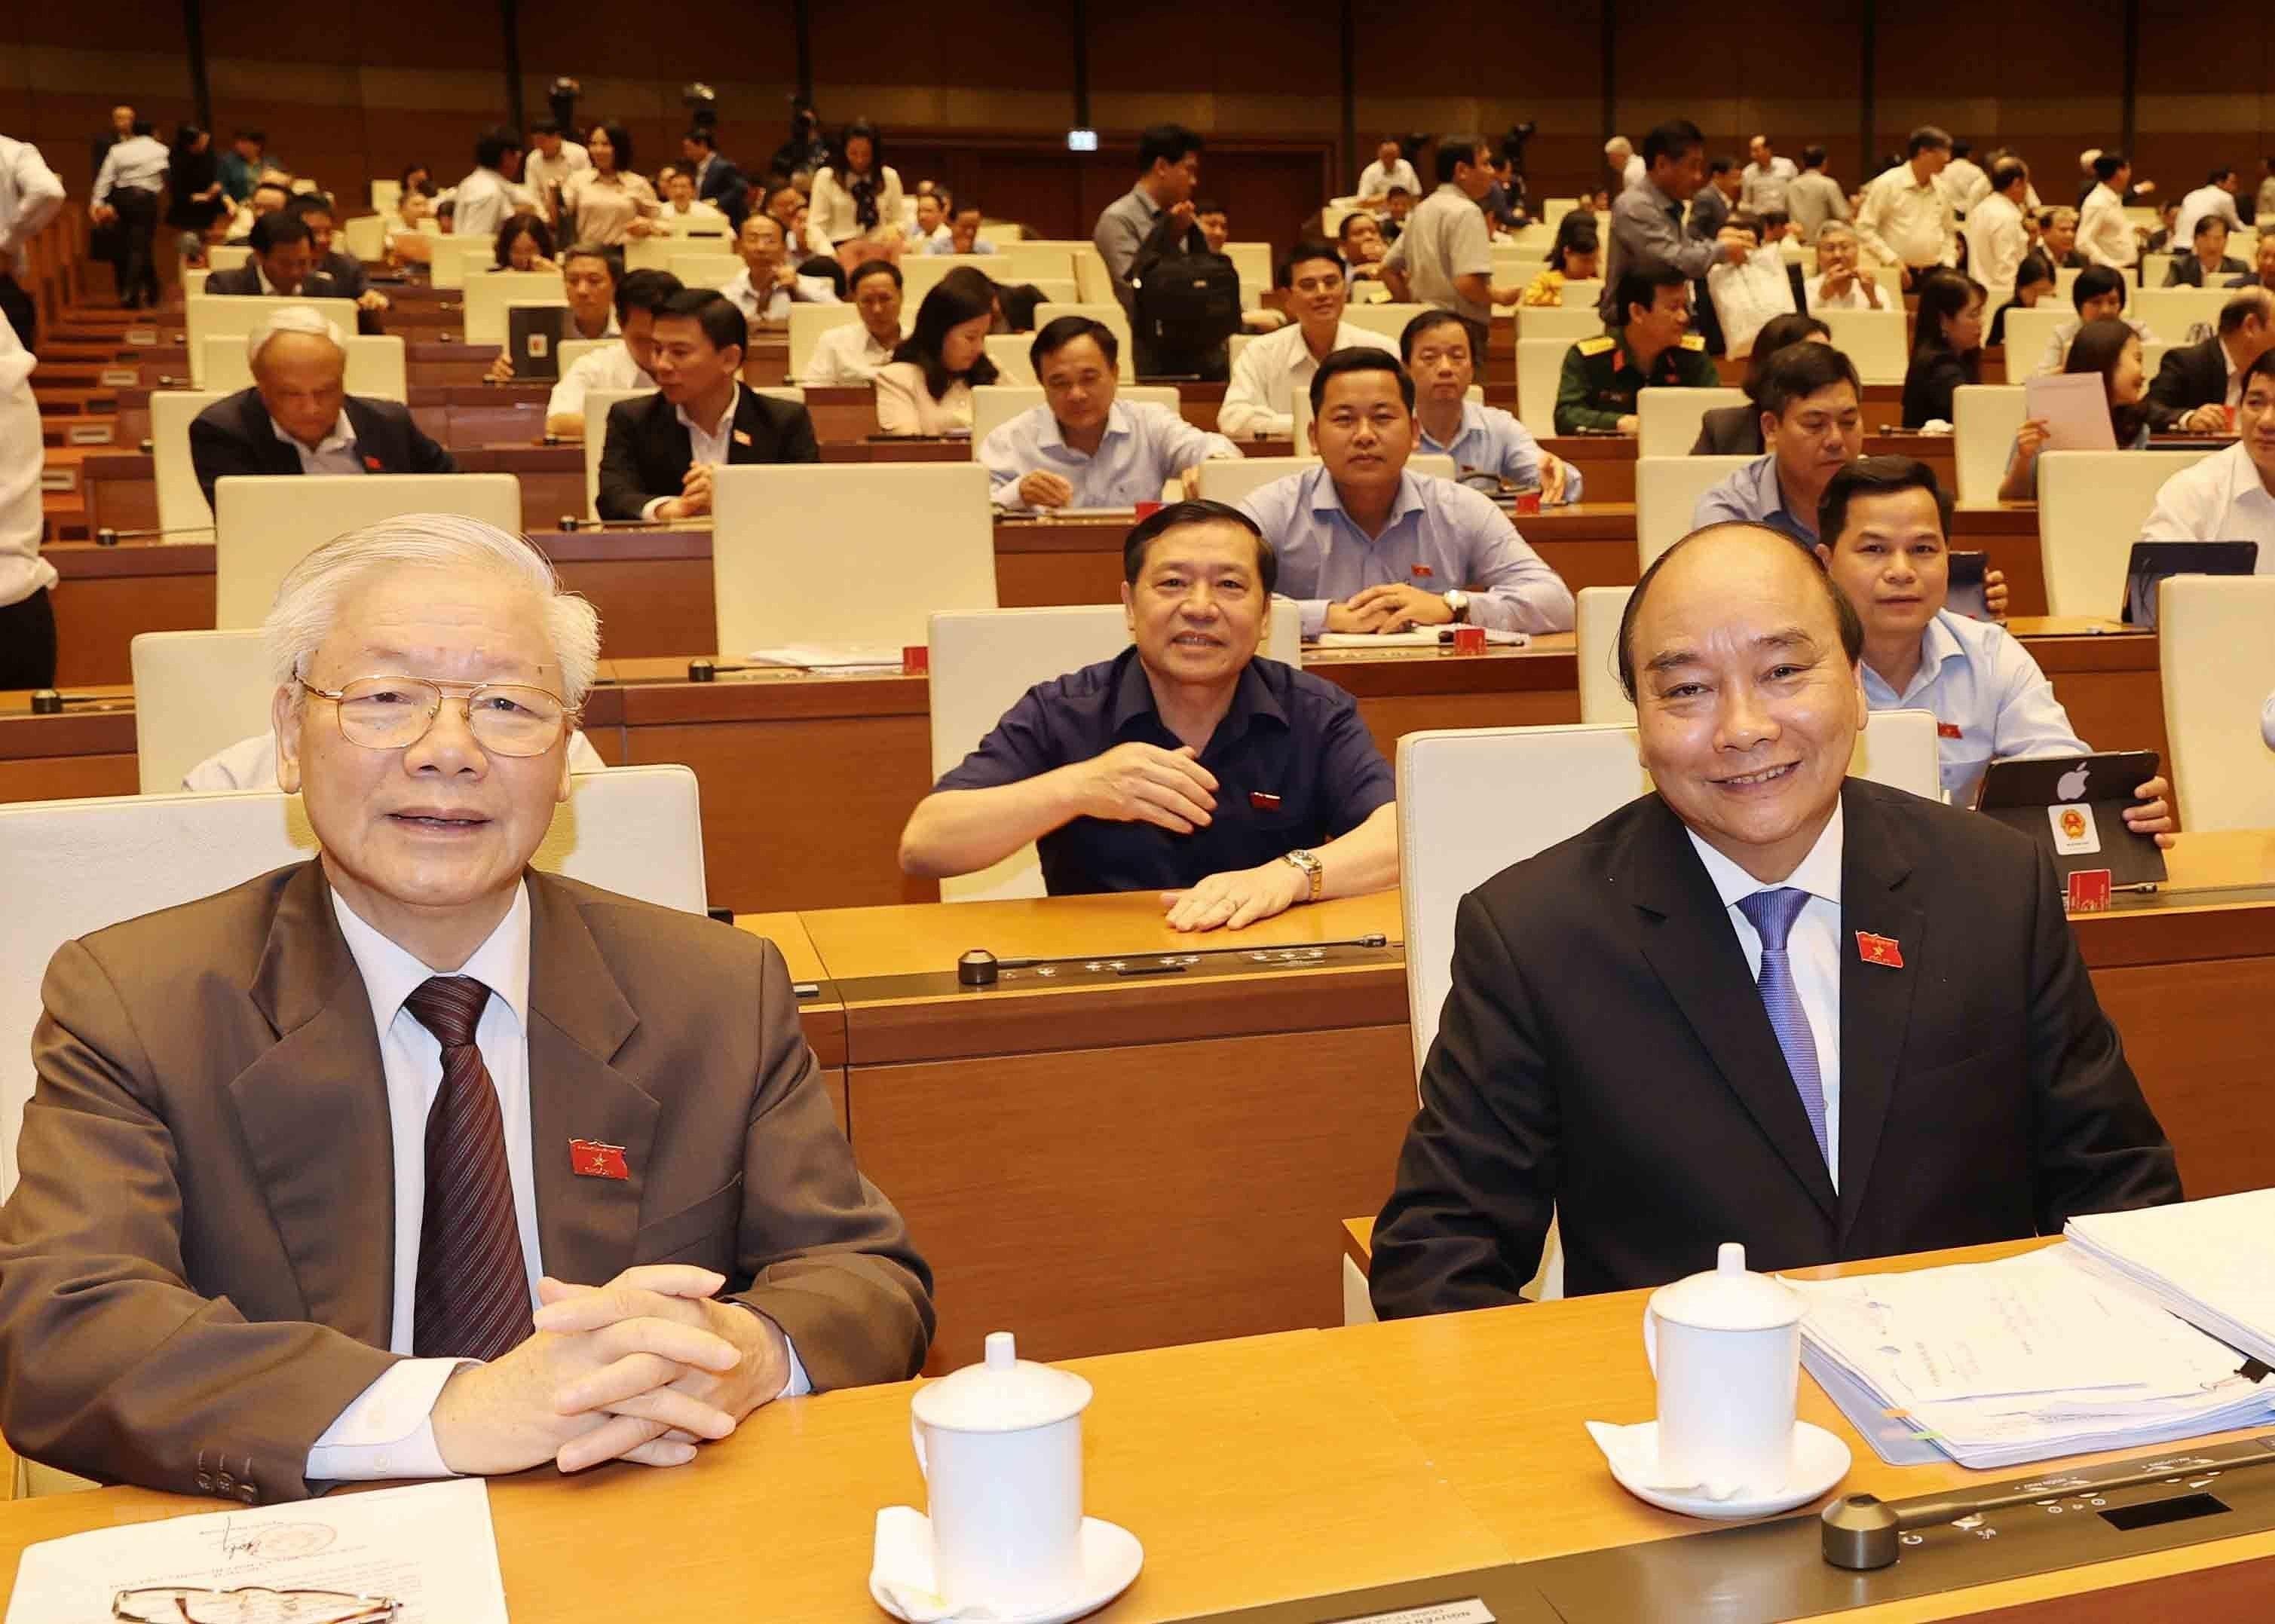 Chu tich nuoc Nguyen Phu Trong trinh Quoc hoi mien nhiem Thu tuong hinh anh 5